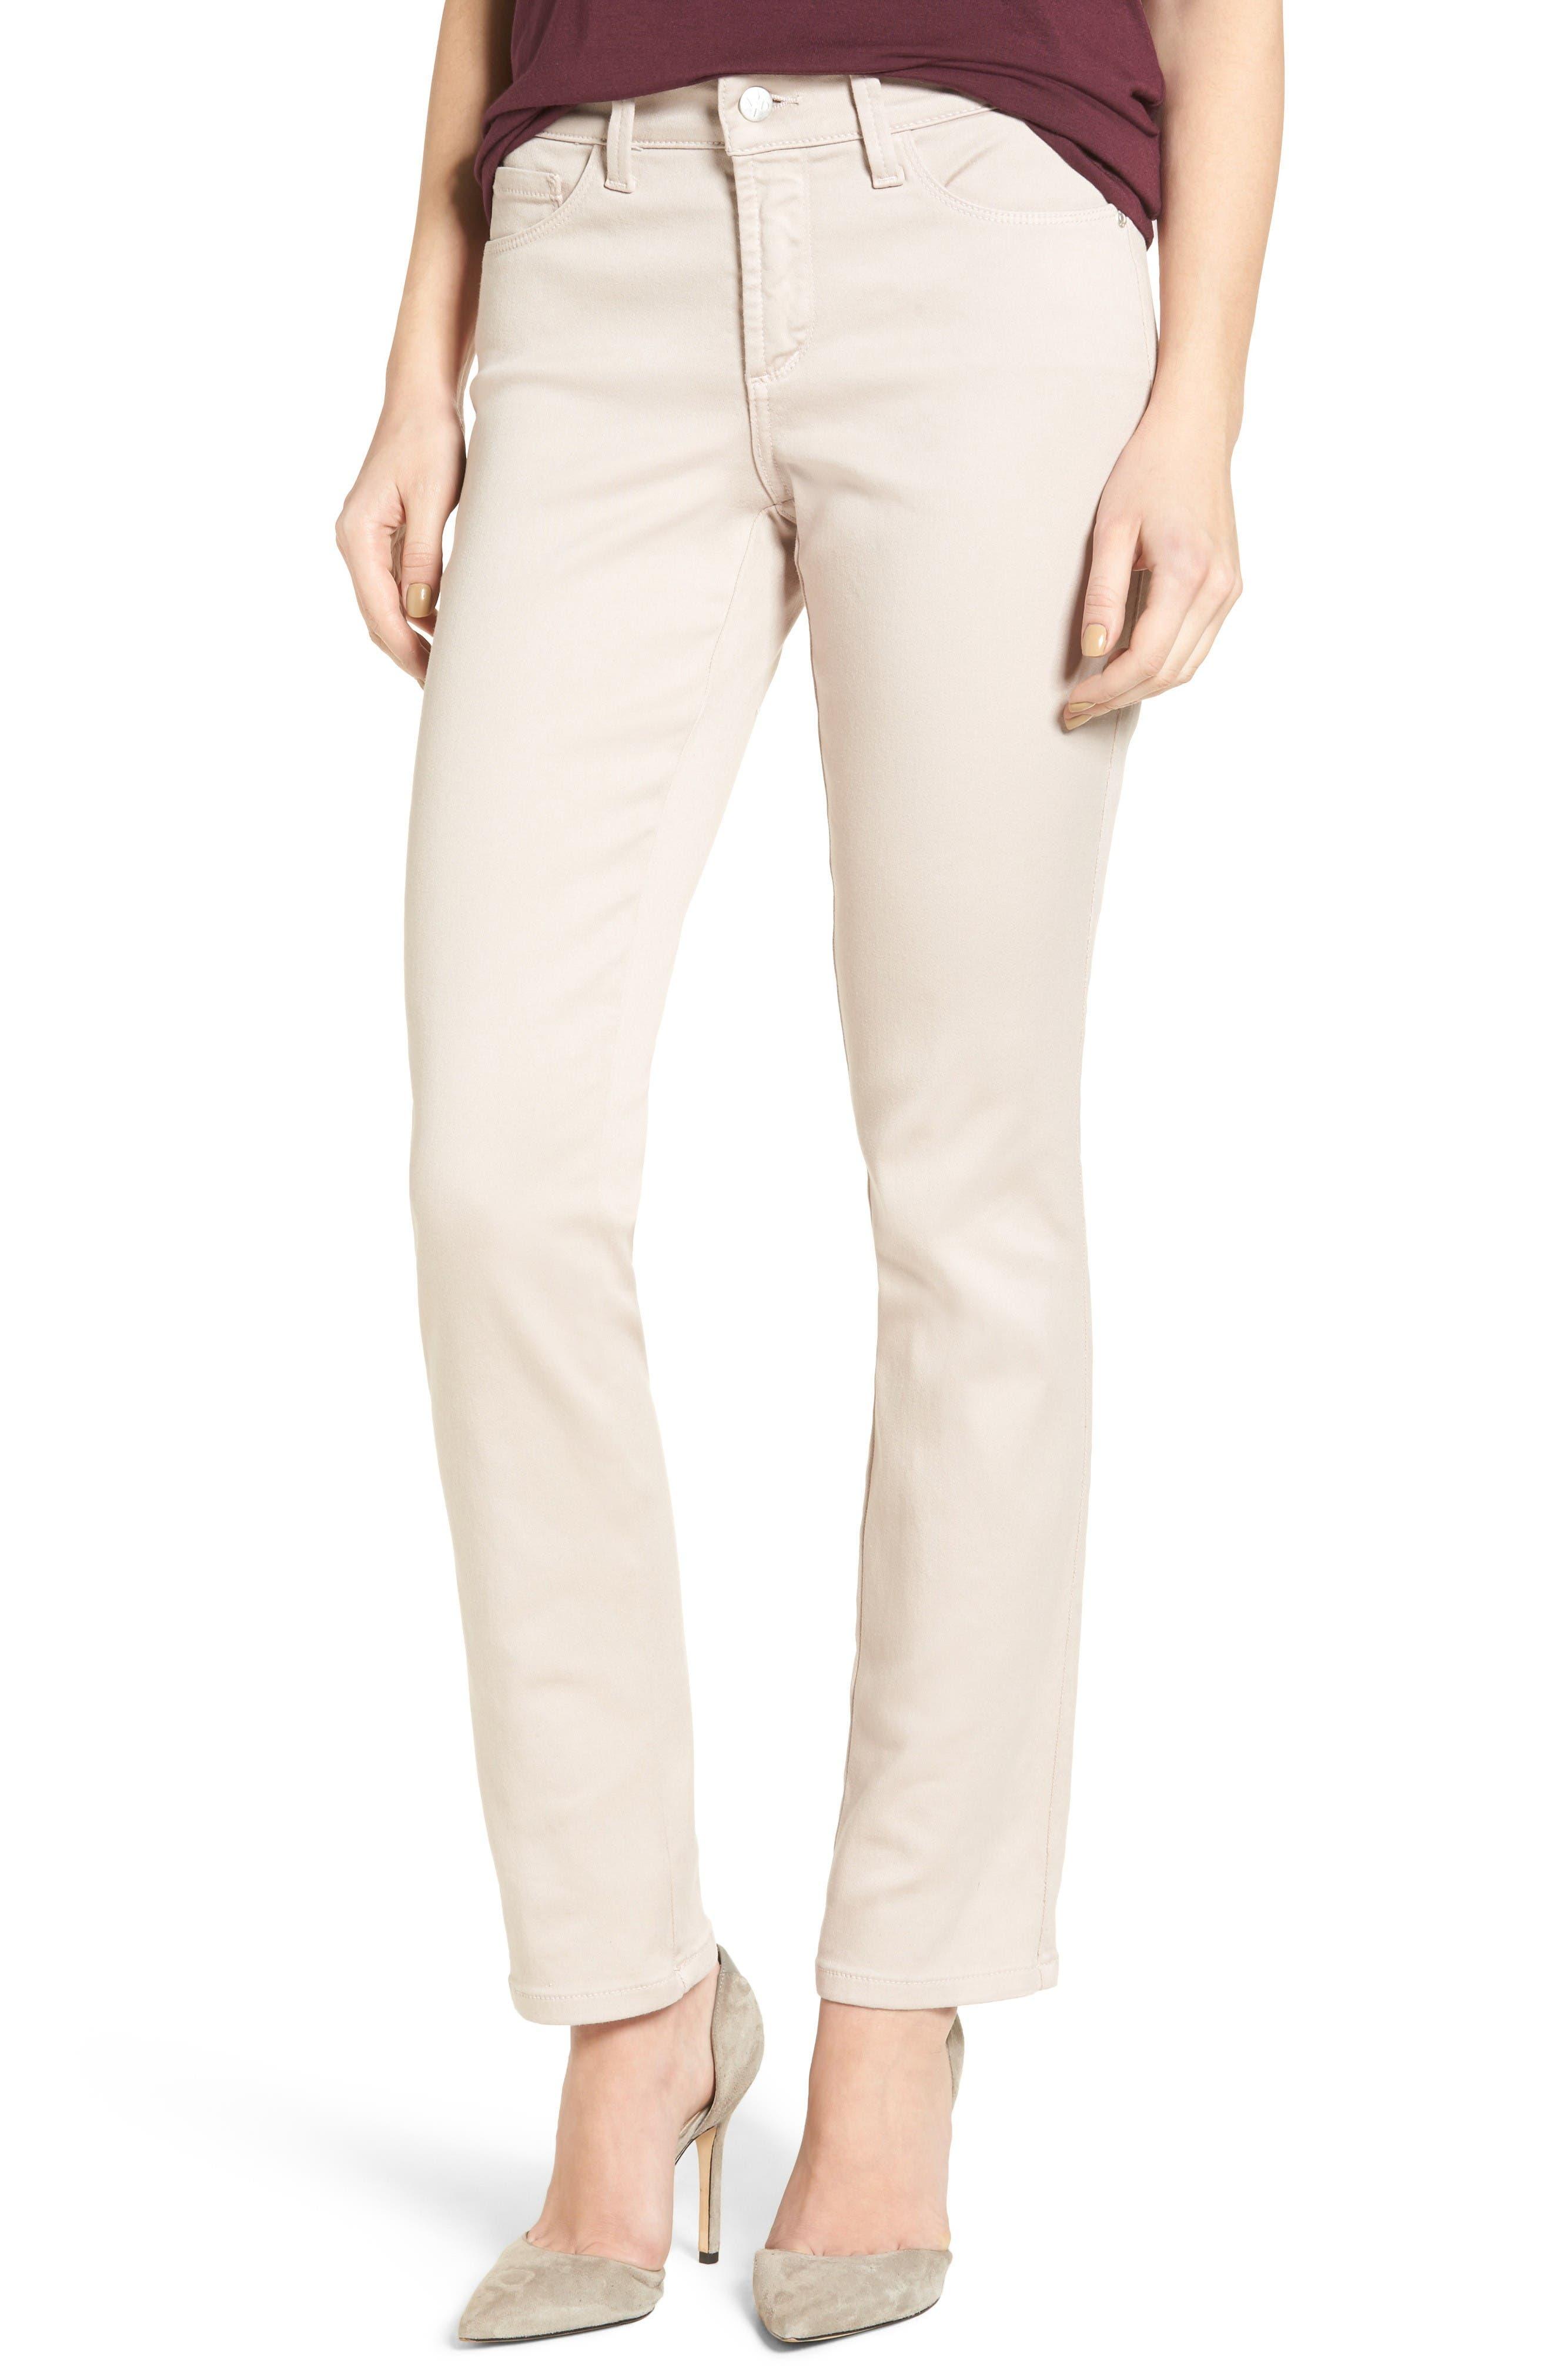 Main Image - NYDJ 'Sheri' Stretch Twill Slim Leg Pants (Regular & Petite)